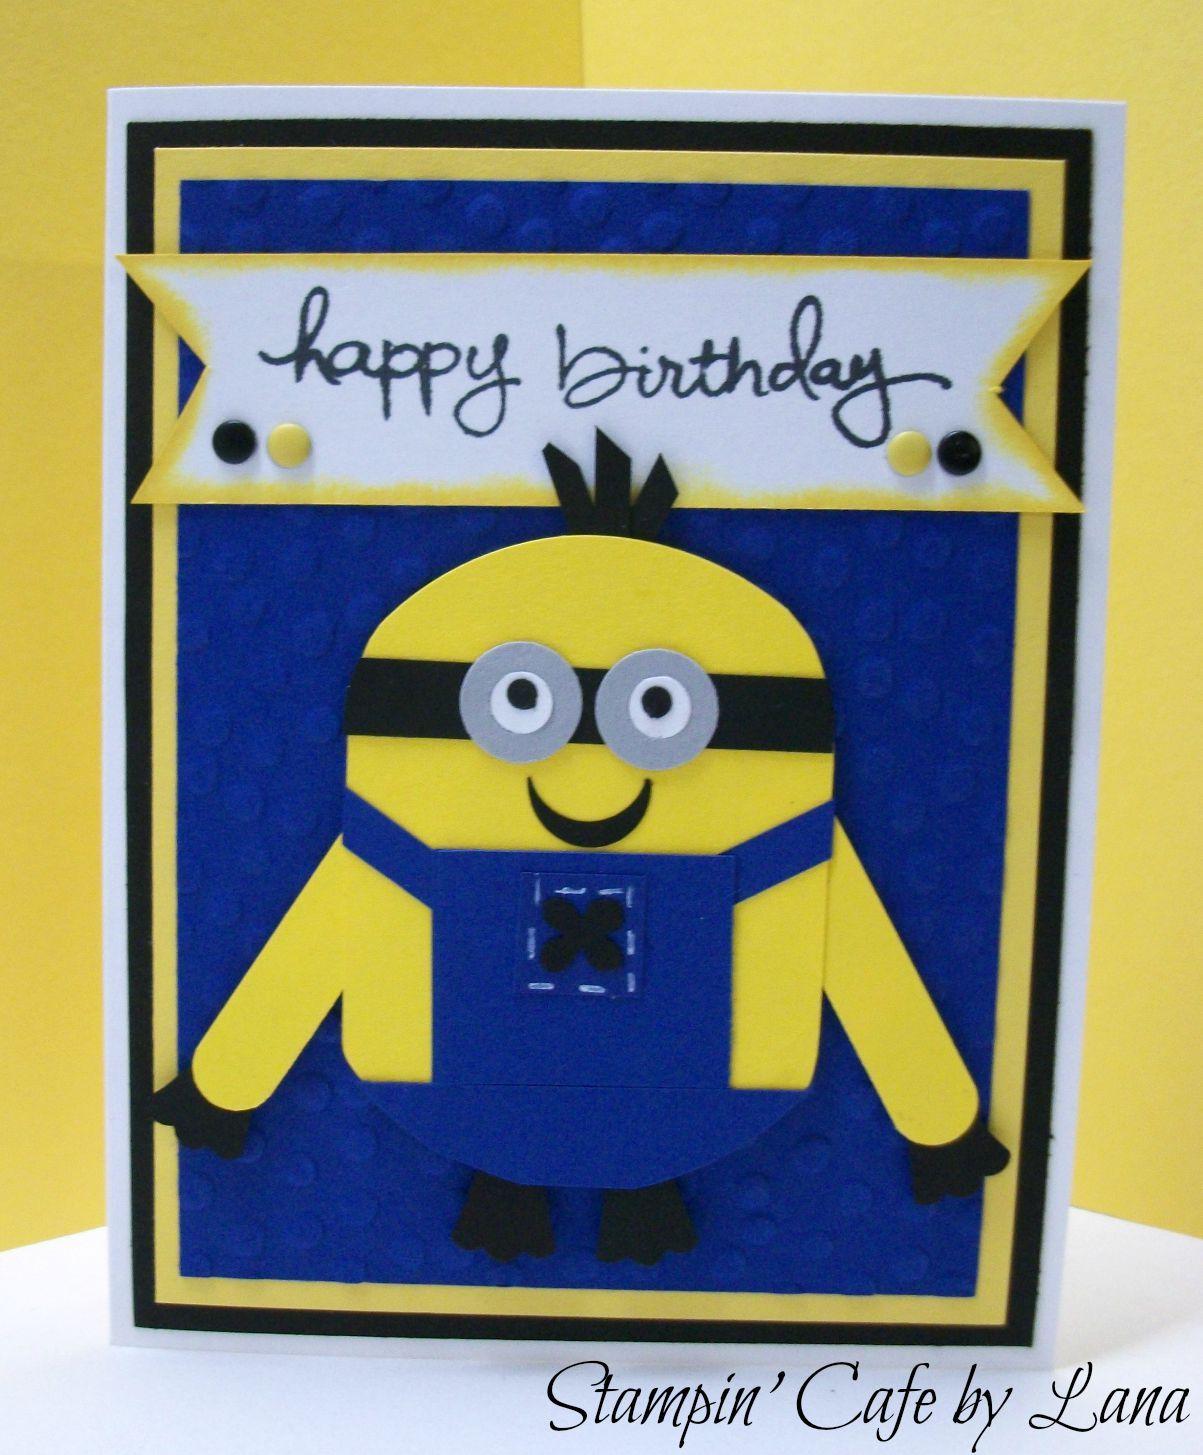 Stampin cafe by lana minion birthday cards birthday cards stampin cafe by lana minion birthday cards bookmarktalkfo Choice Image